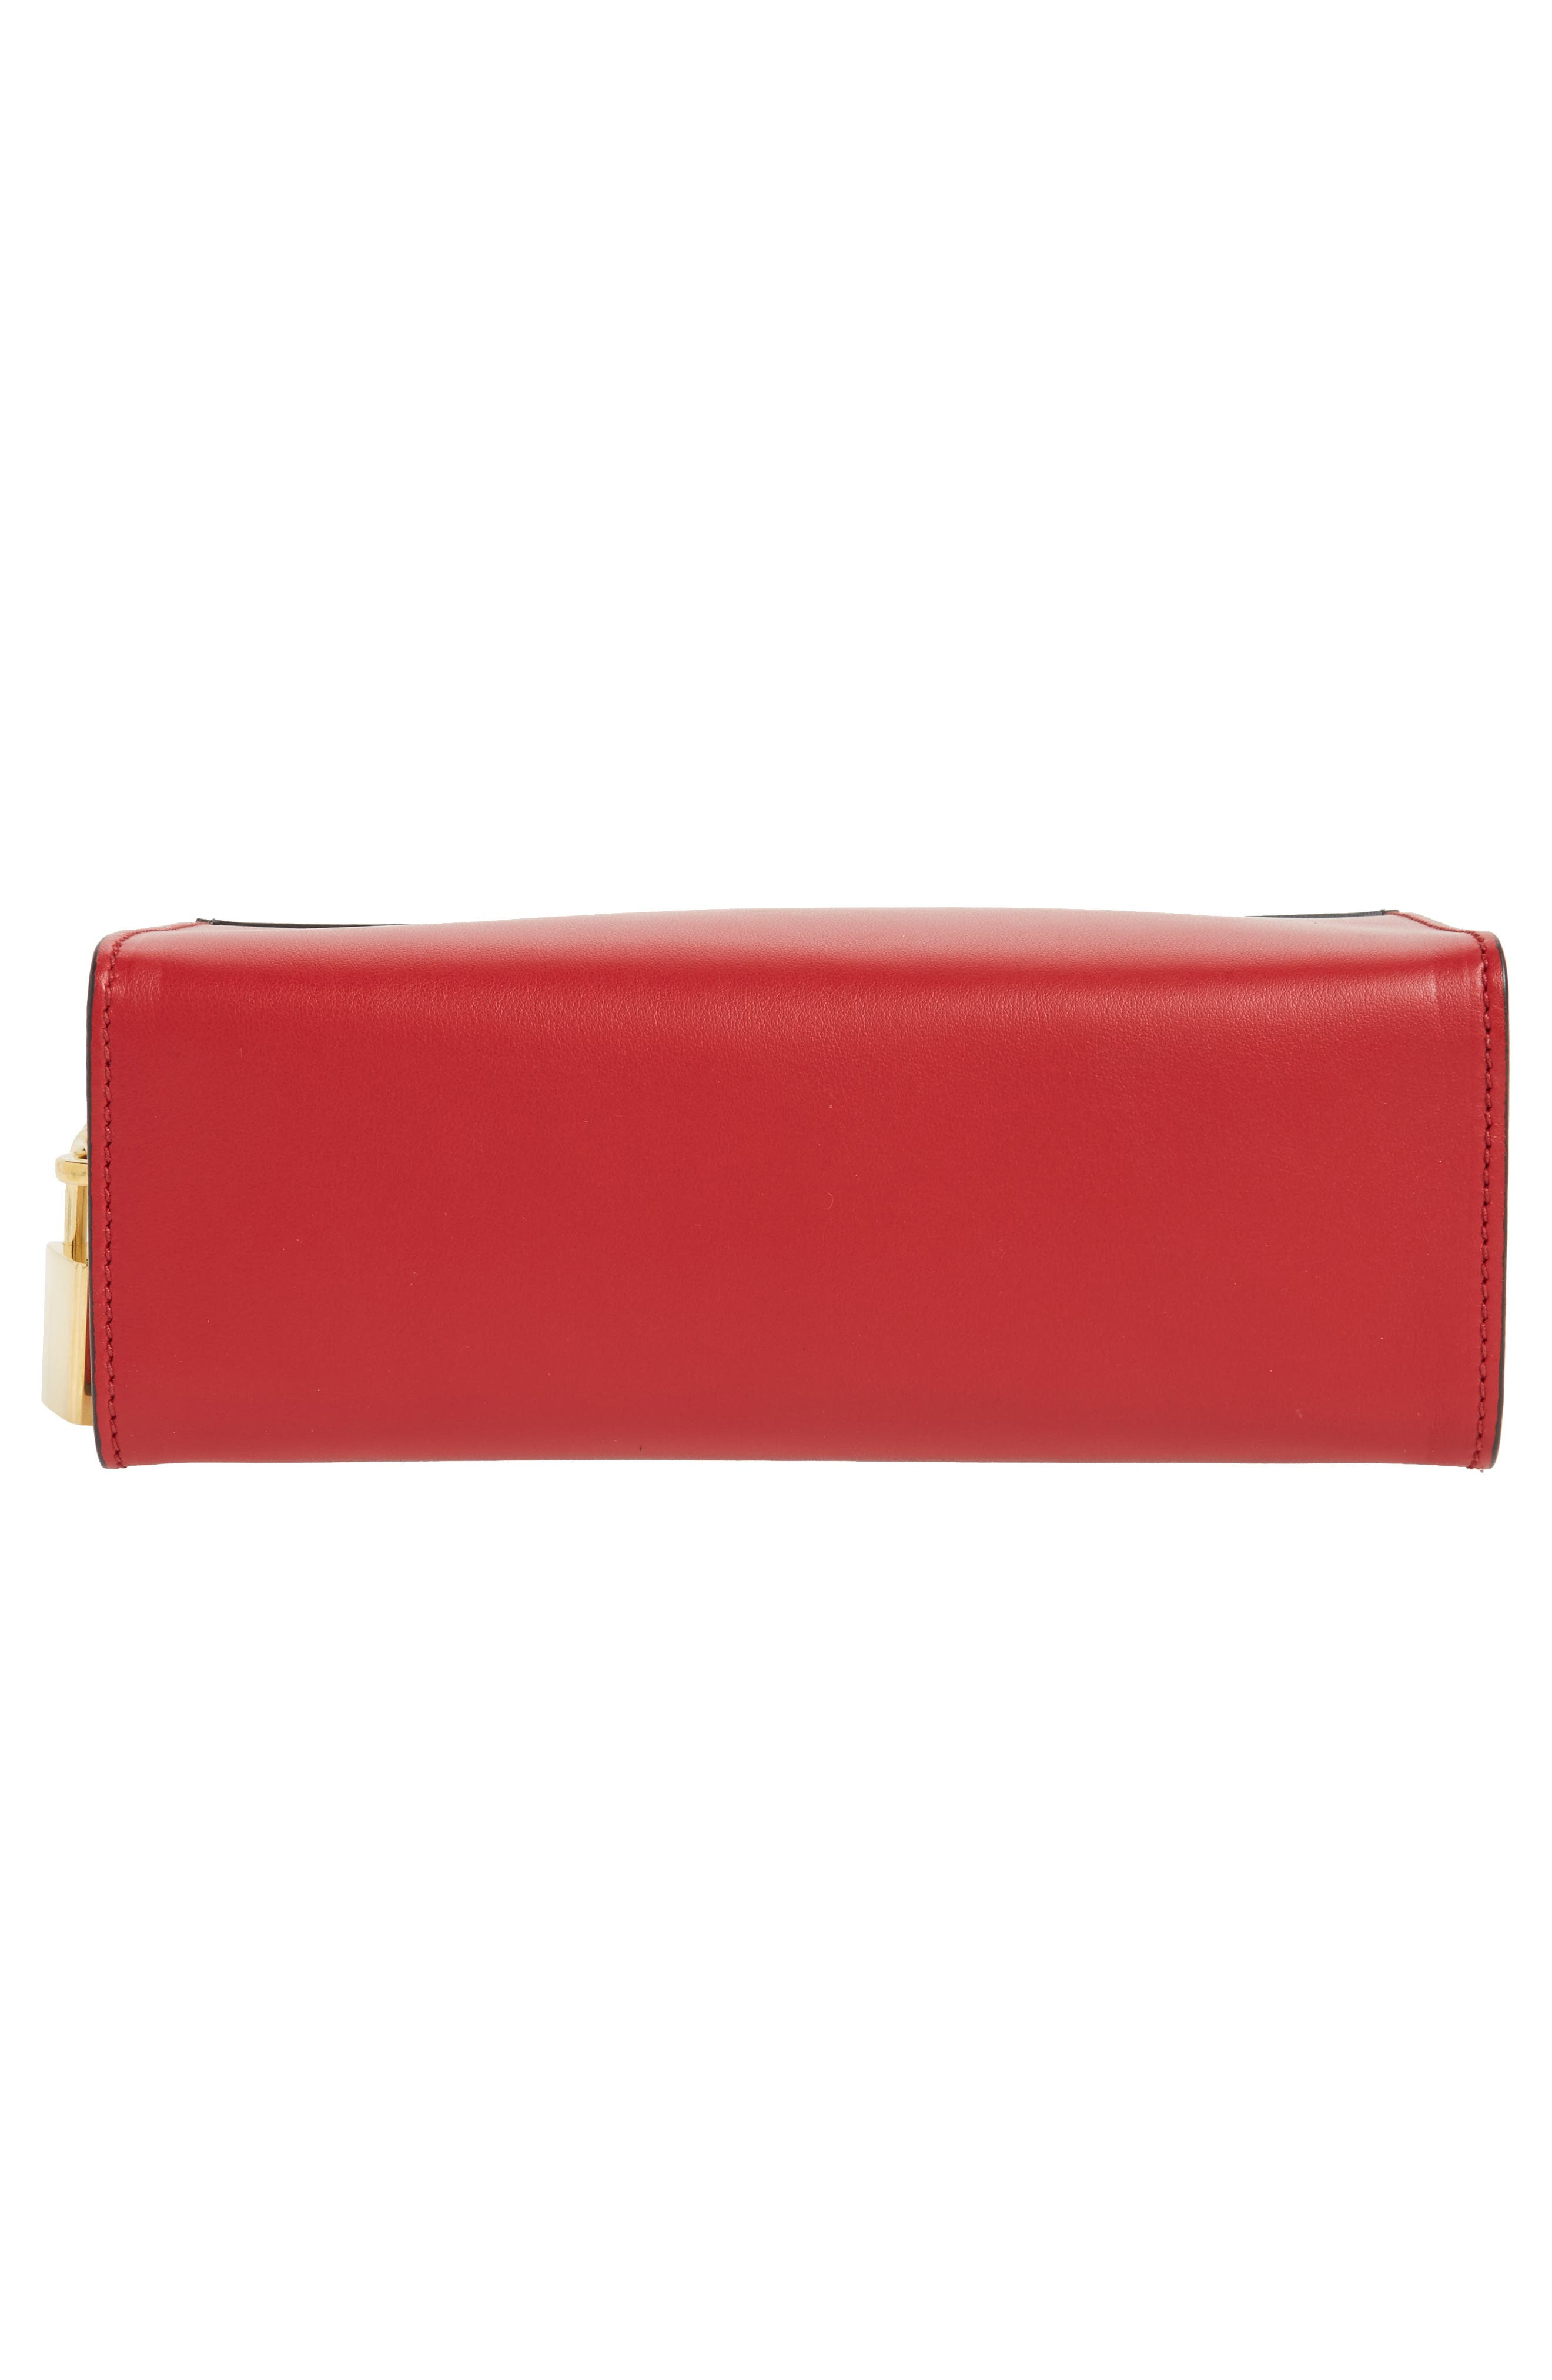 Esplanade Saffiano & City Calfskin Shoulder Bag,                             Alternate thumbnail 6, color,                             Fuoco